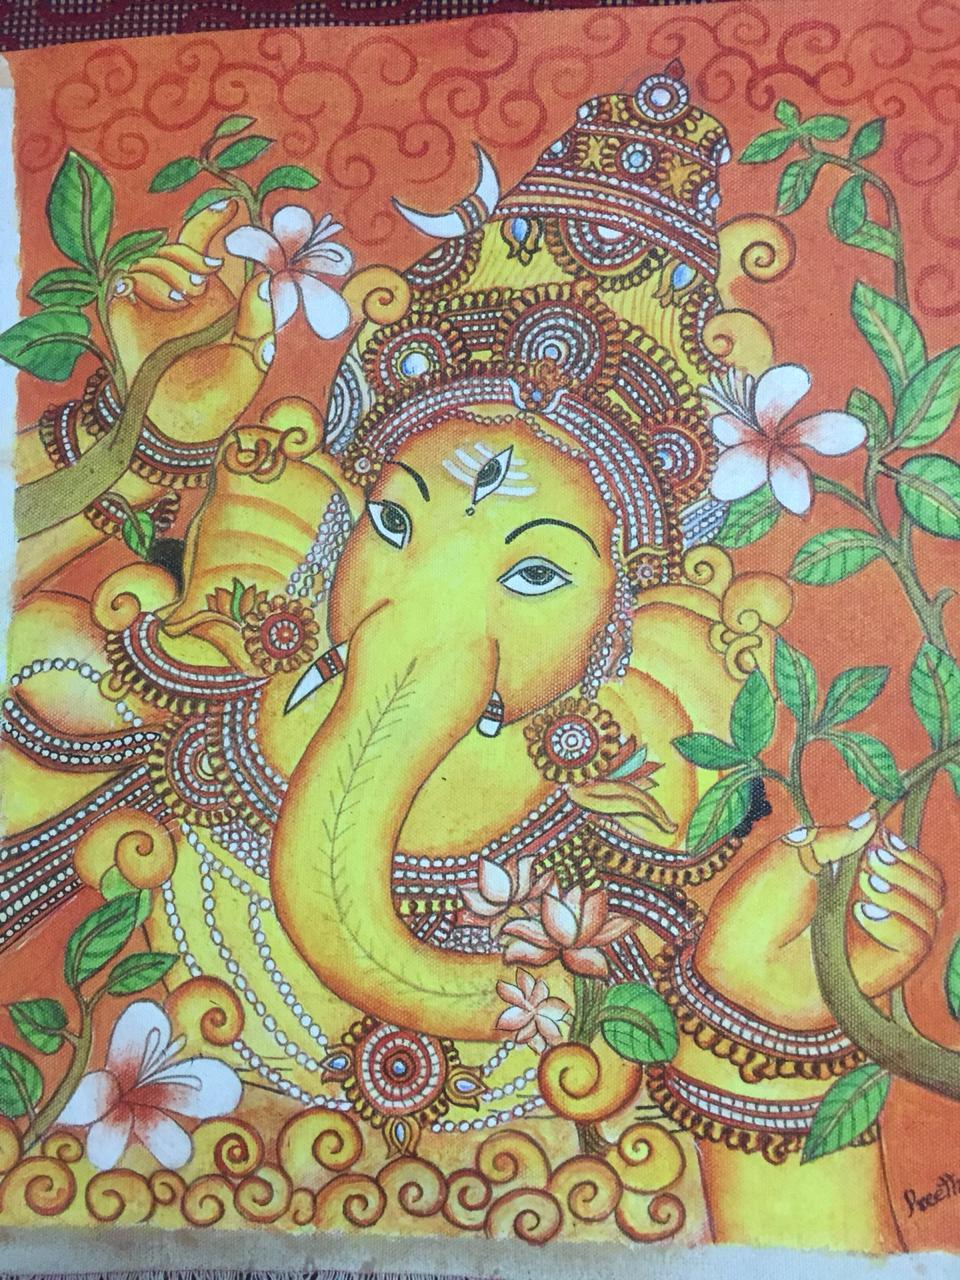 Kerala Style Carpenter Works And Designs September 2013: Ganesha : The Elephant God